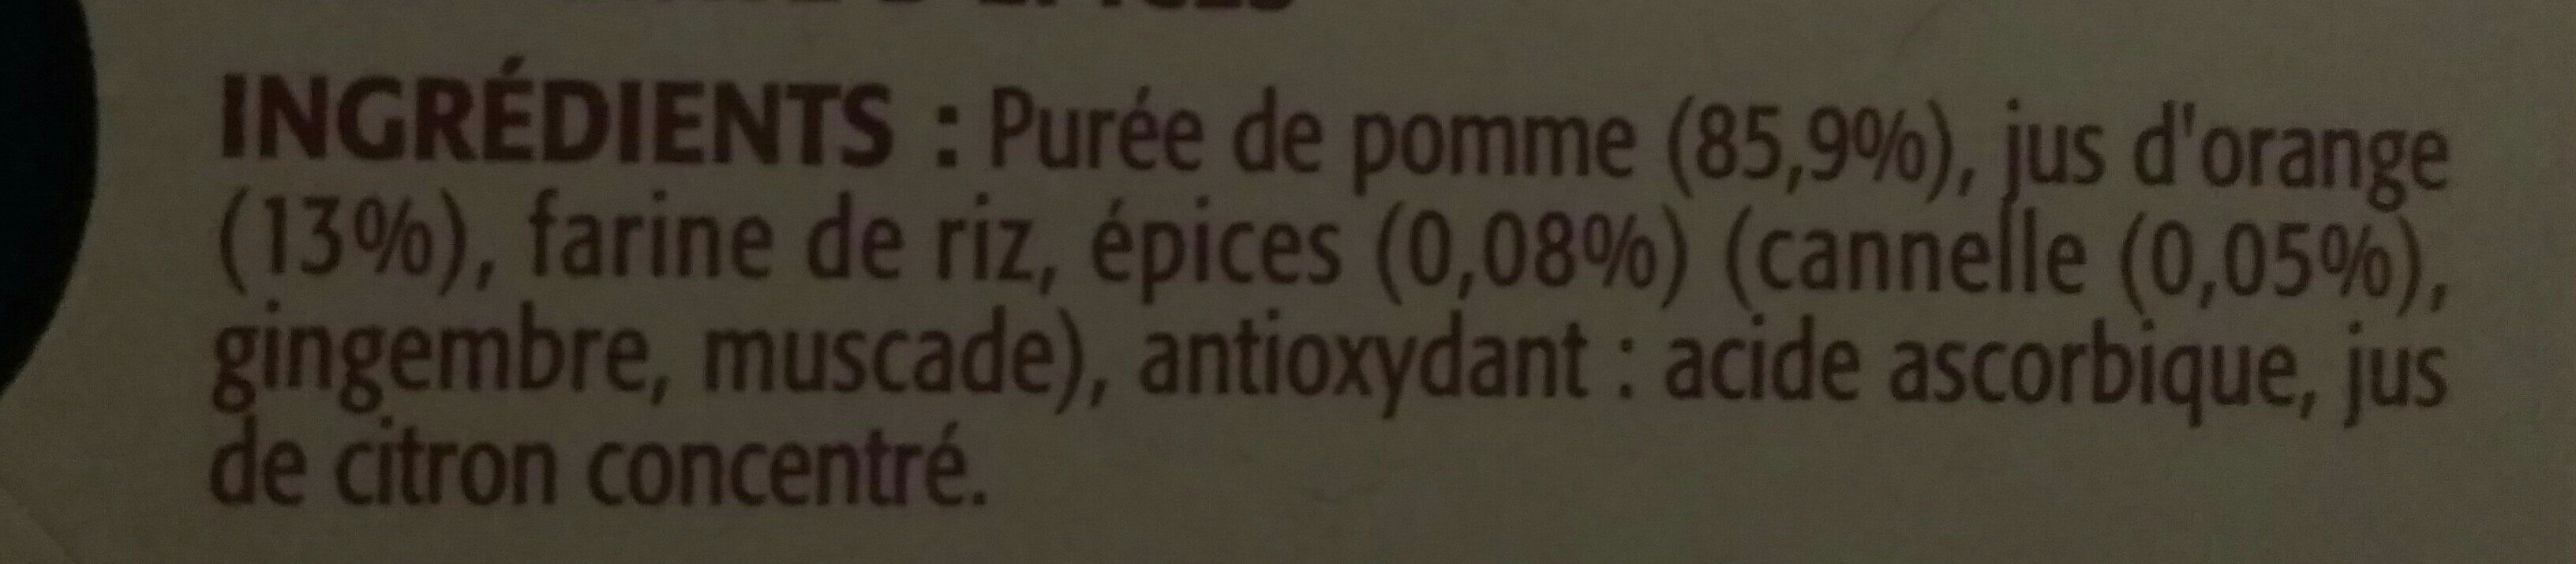 Compote pomme orange épices - Ingrédients - fr